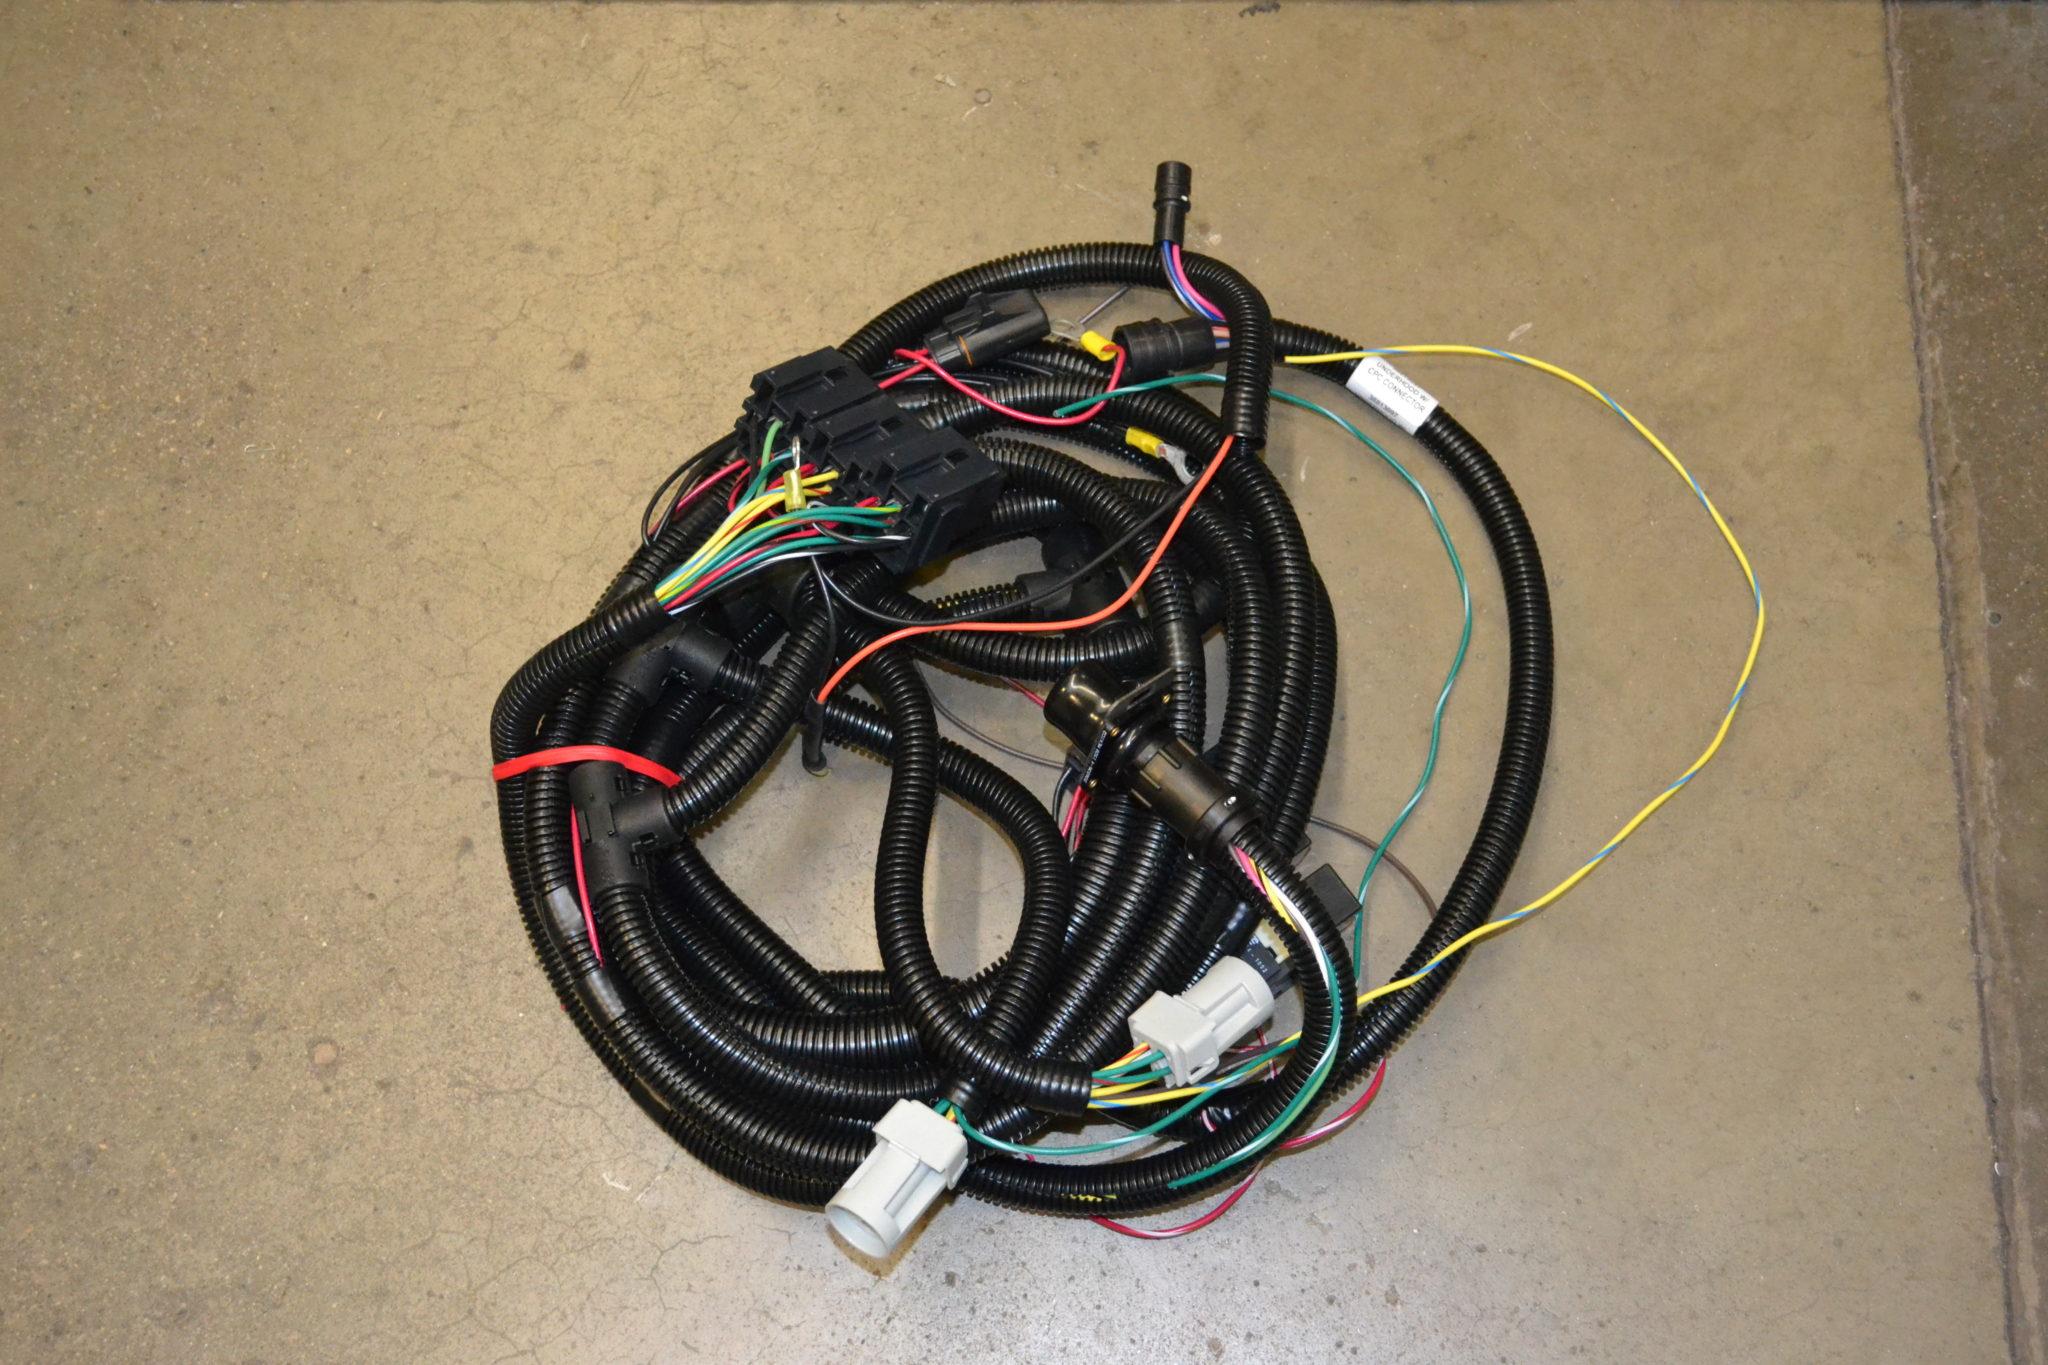 hiniker v plow wiring diagram usb keyboard snow underhood harness